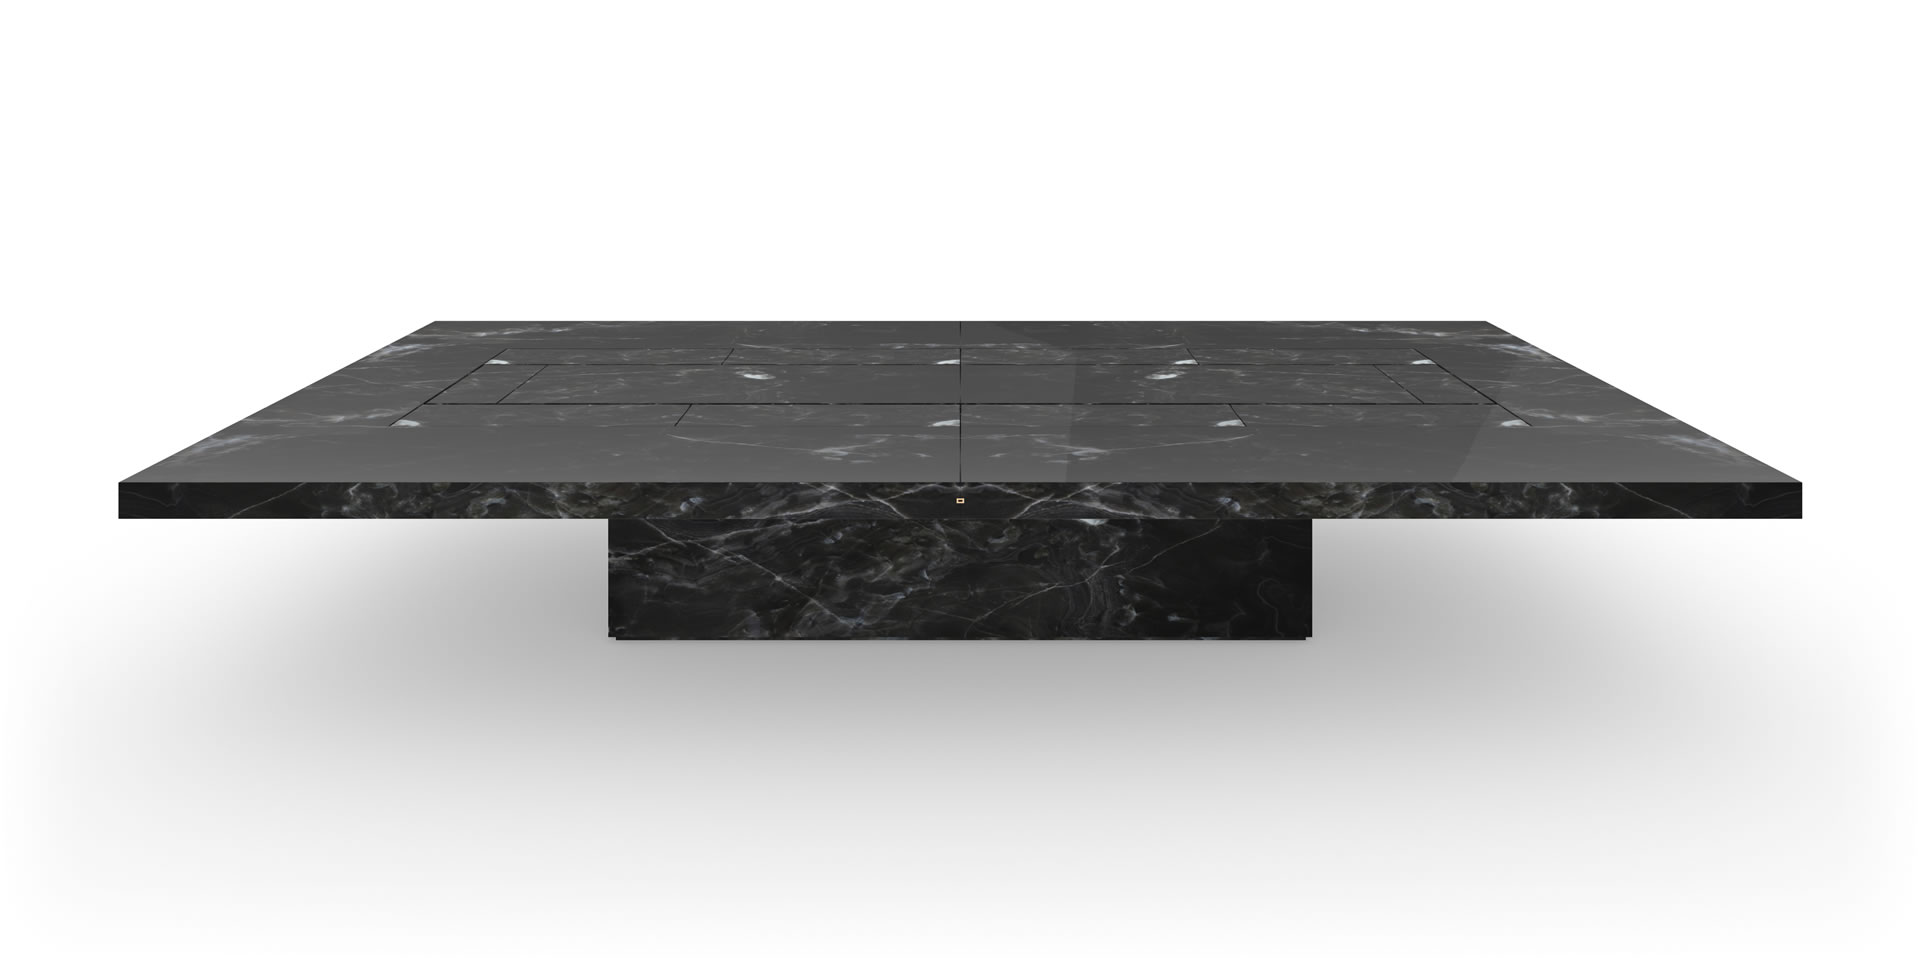 CONFERENCE TABLE IIV MARBLE BLACK FELIX SCHWAKE - White marble conference table